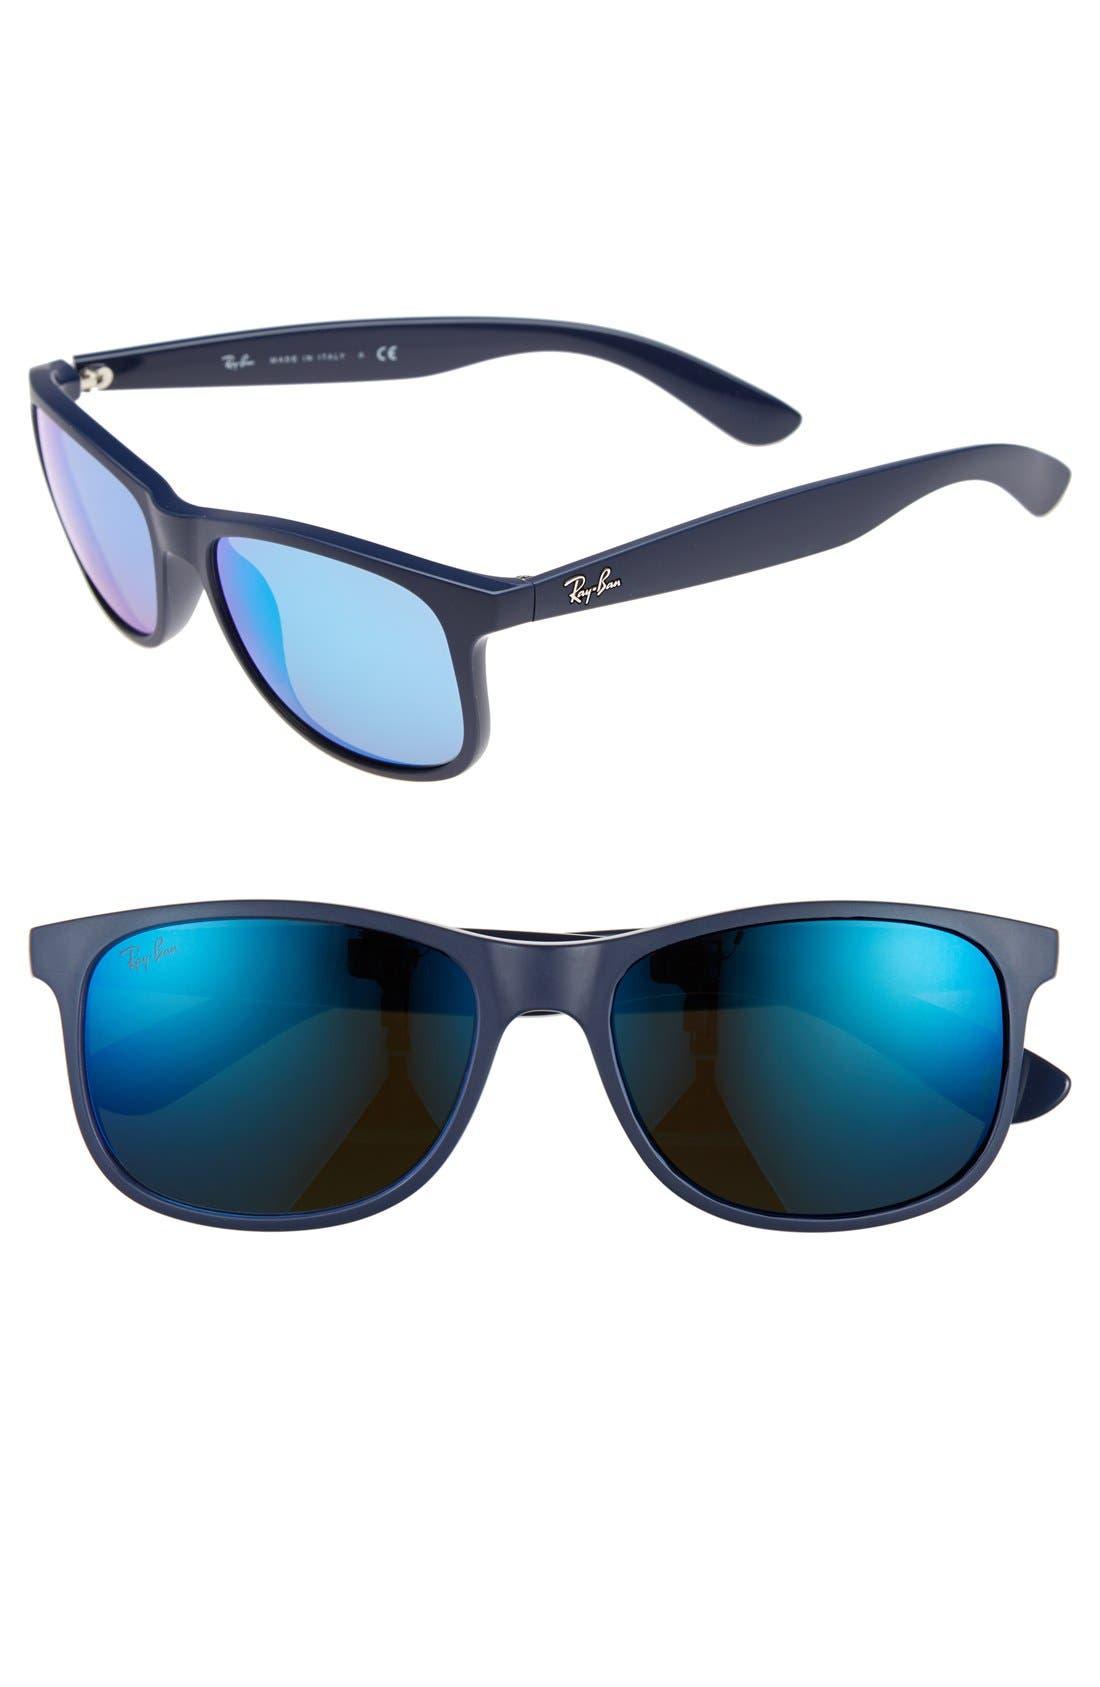 Main Image - Ray-Ban 'TECH Carbon Fiber' 58mm Aviator Sunglasses